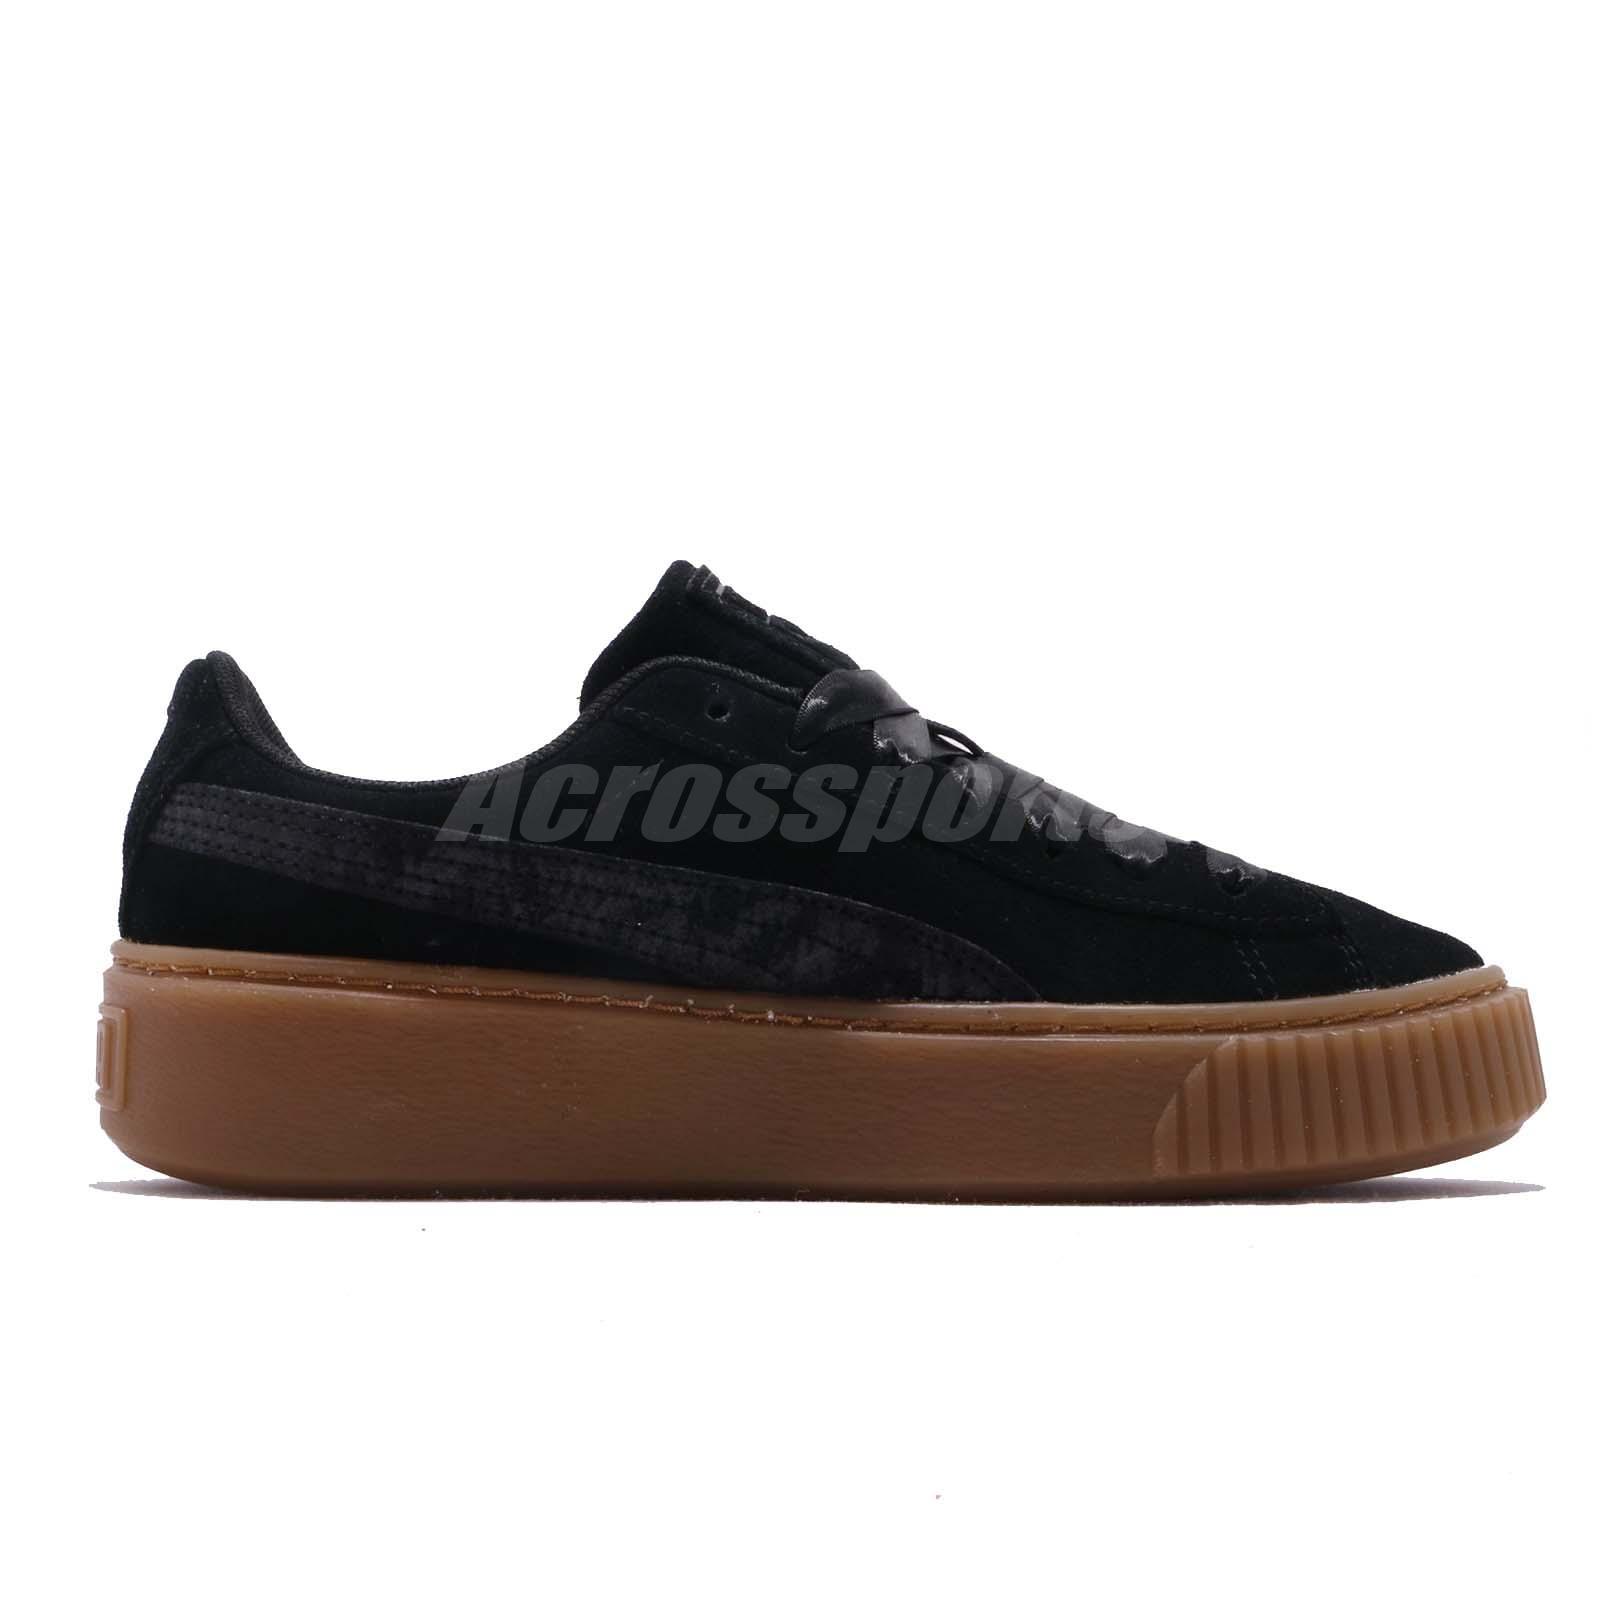 7f8d4f1512 Details about Puma Platform Galaxy Wns Black Gum Silver Women Casual Shoes  Sneakers 369172-03